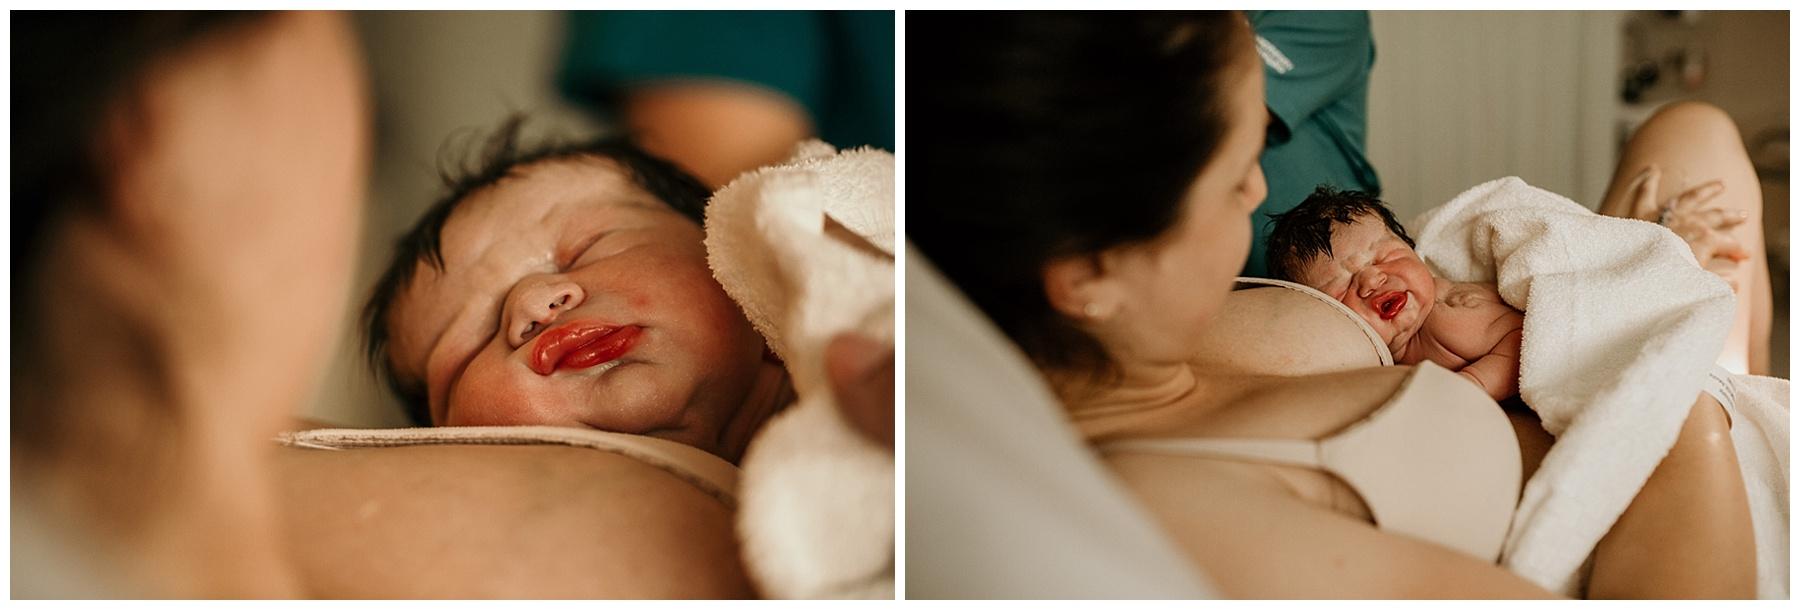 birth - melbourne birth photography